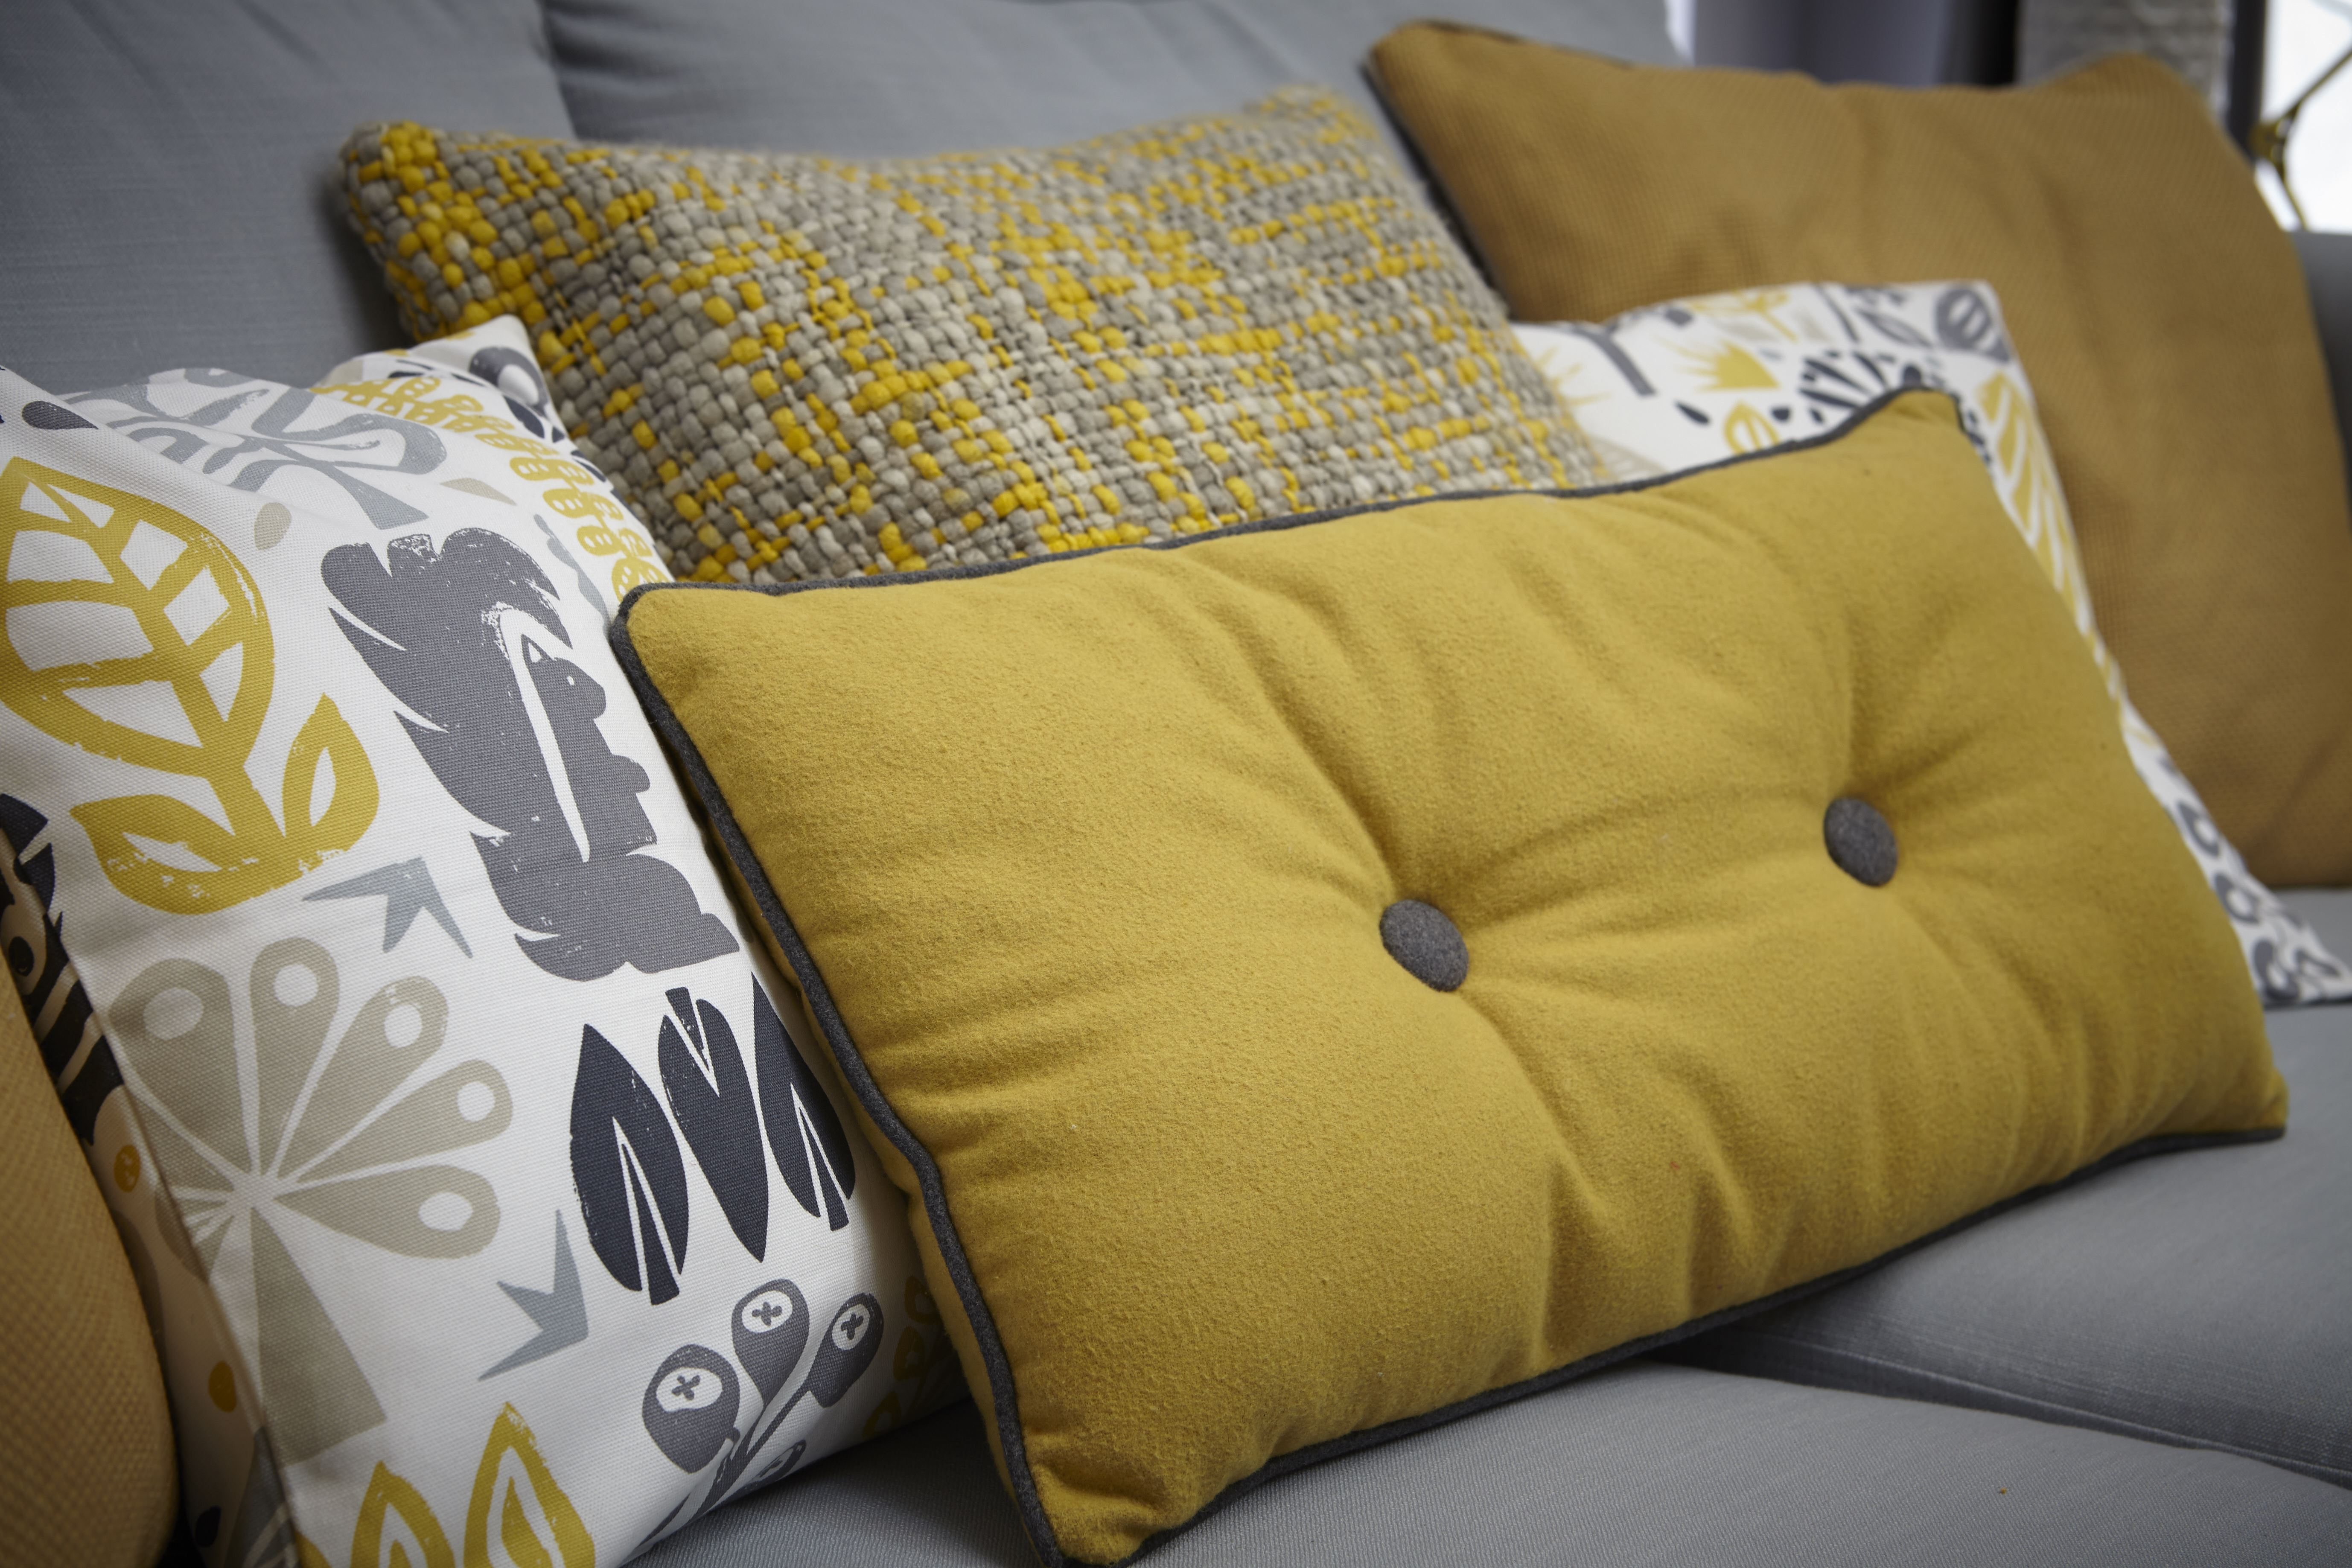 sofa pads uk sleepers for rvs so good the treasure hunter well designed